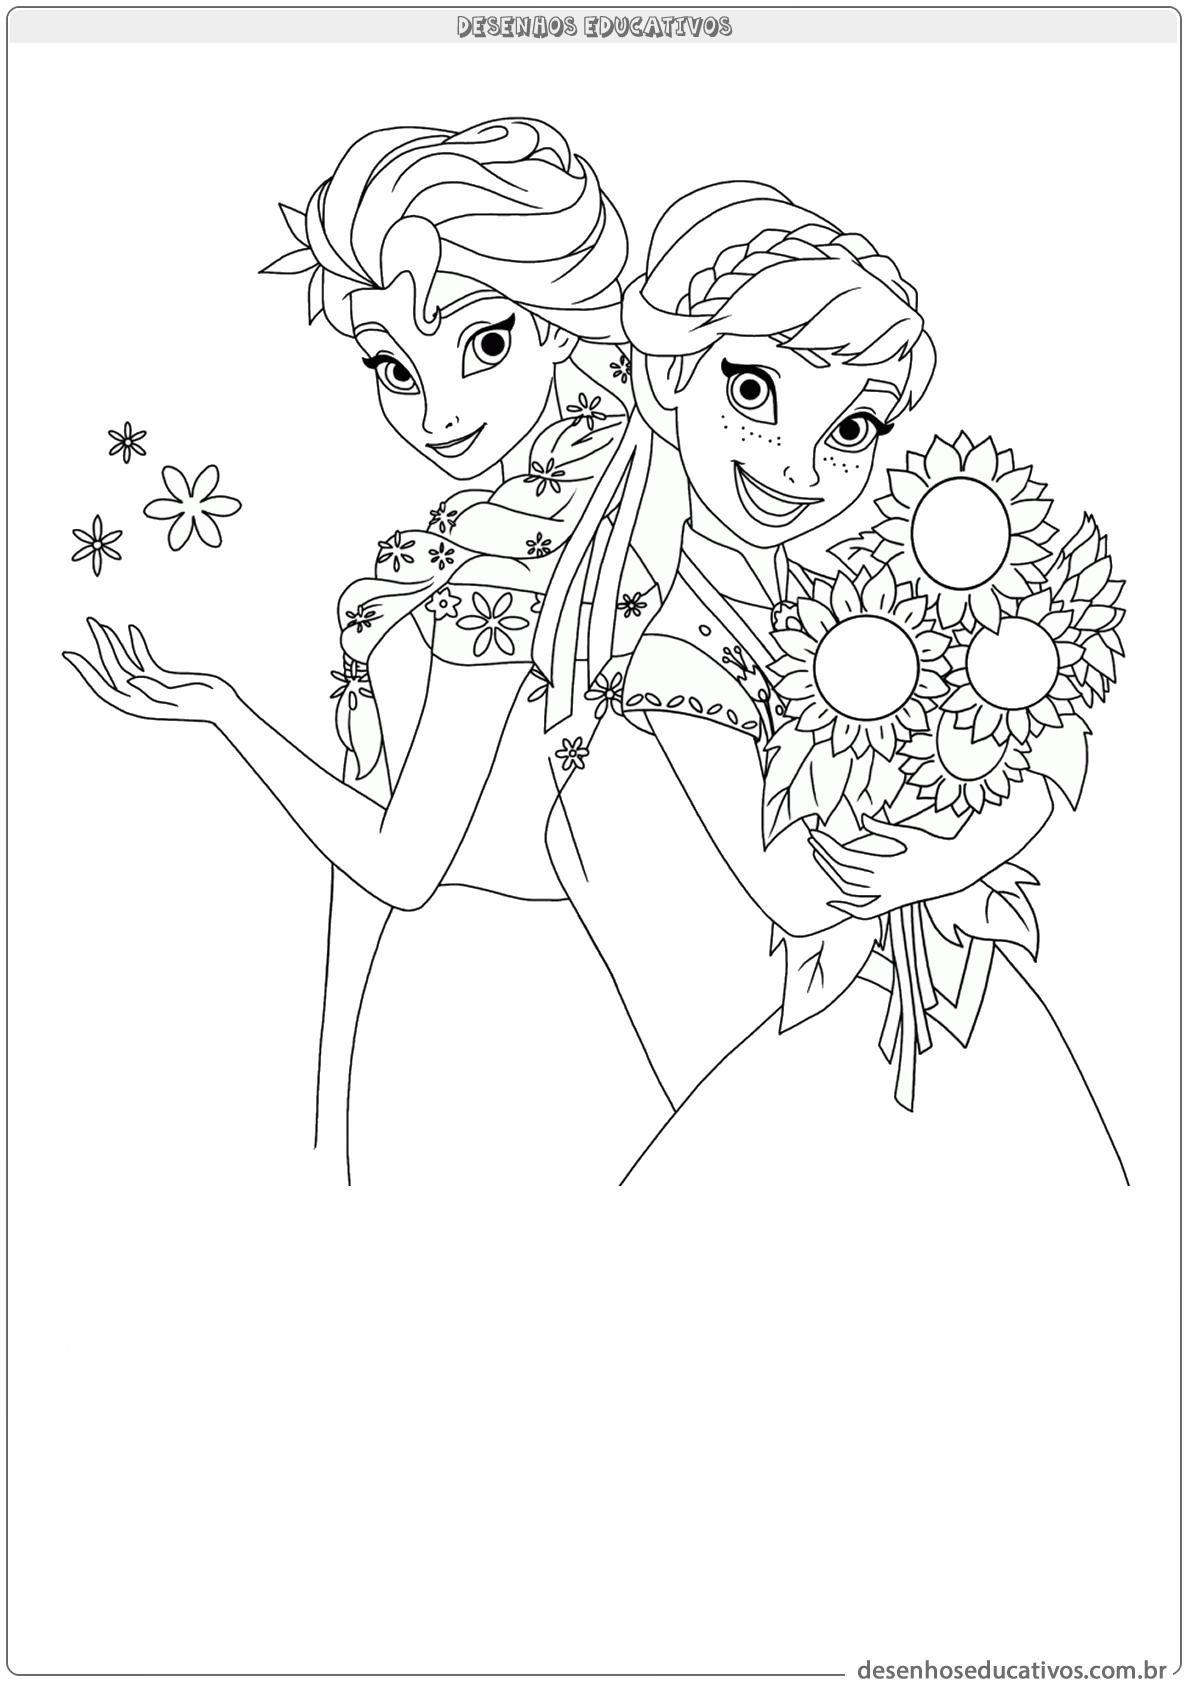 Desenhos Educativos Frozen Elsa E Ana Desenhos Educativos